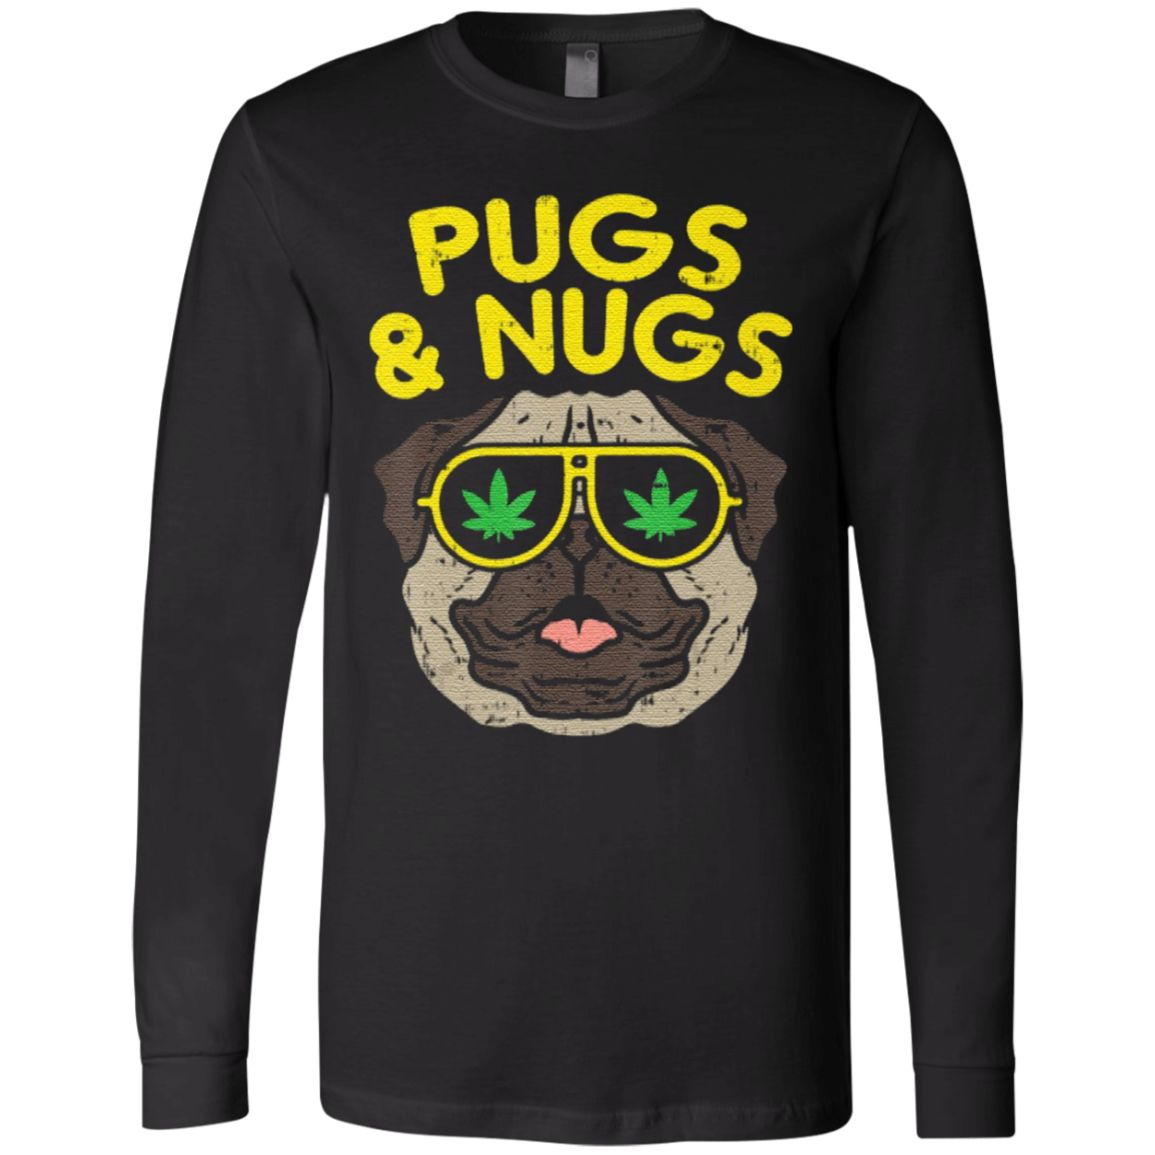 Pugs And Nugs Weed Cannabis 420 Smoking T Shirt